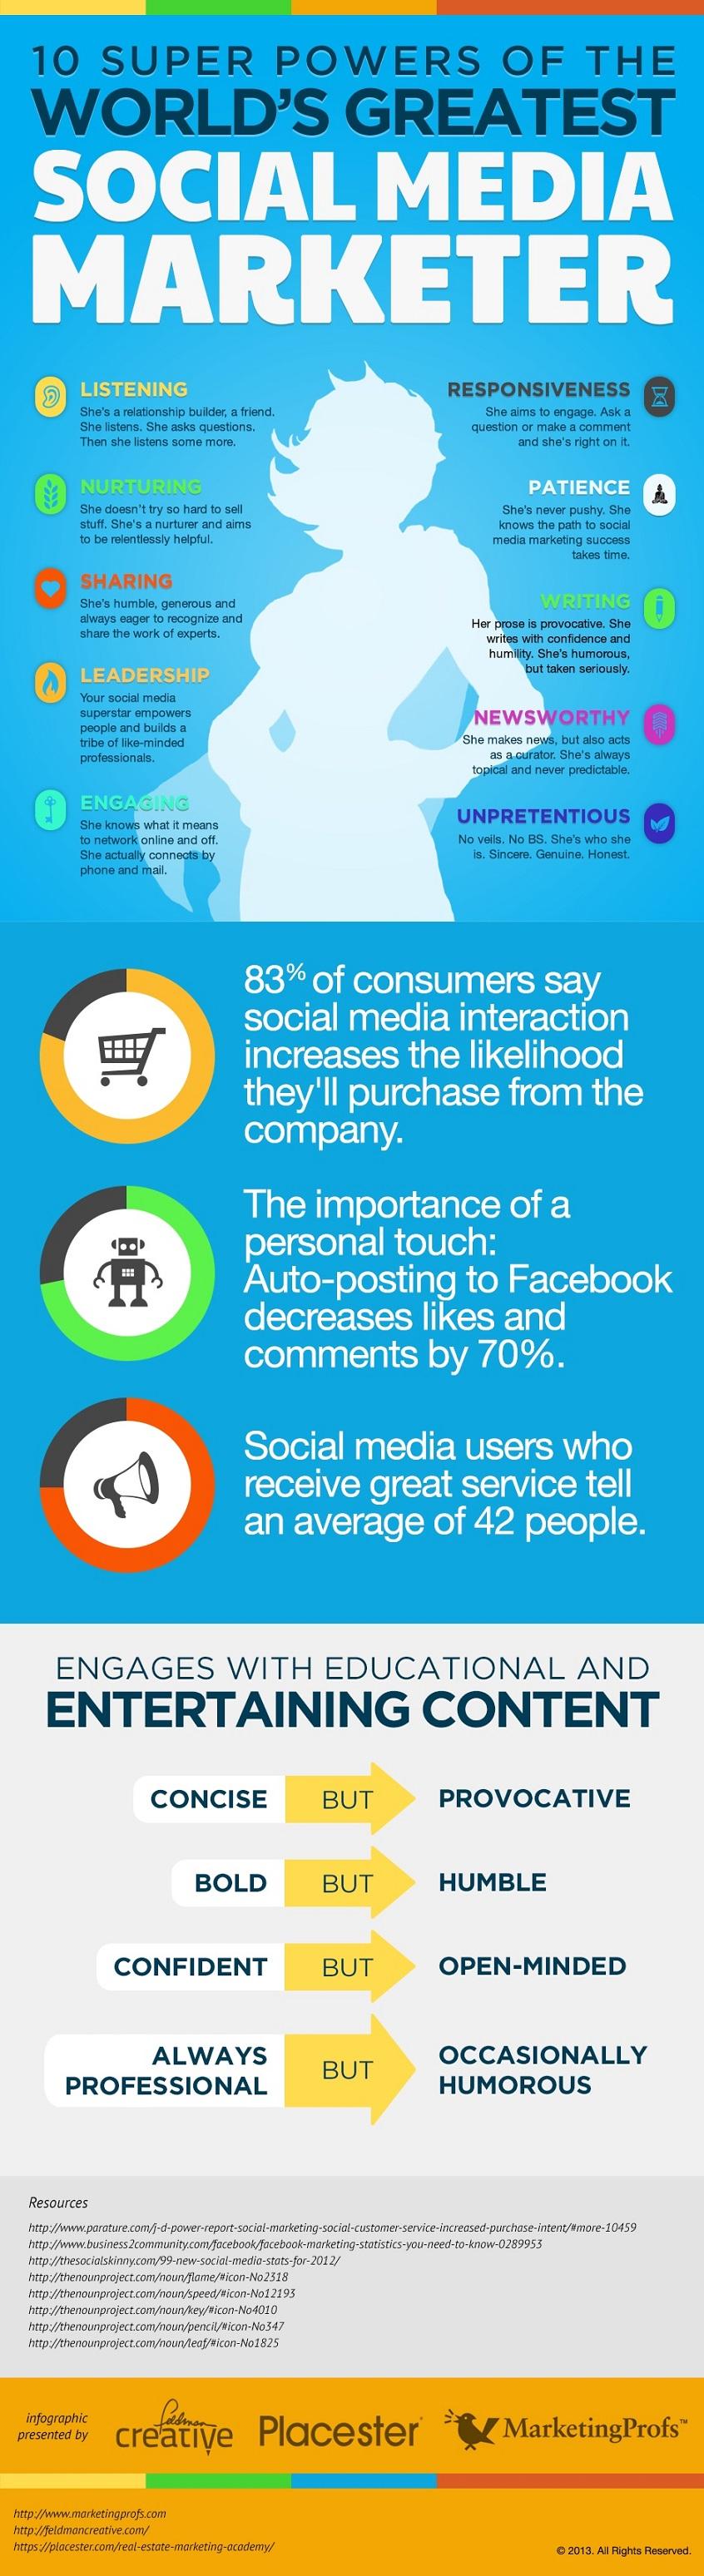 10 qualitá del miglior social media marketer